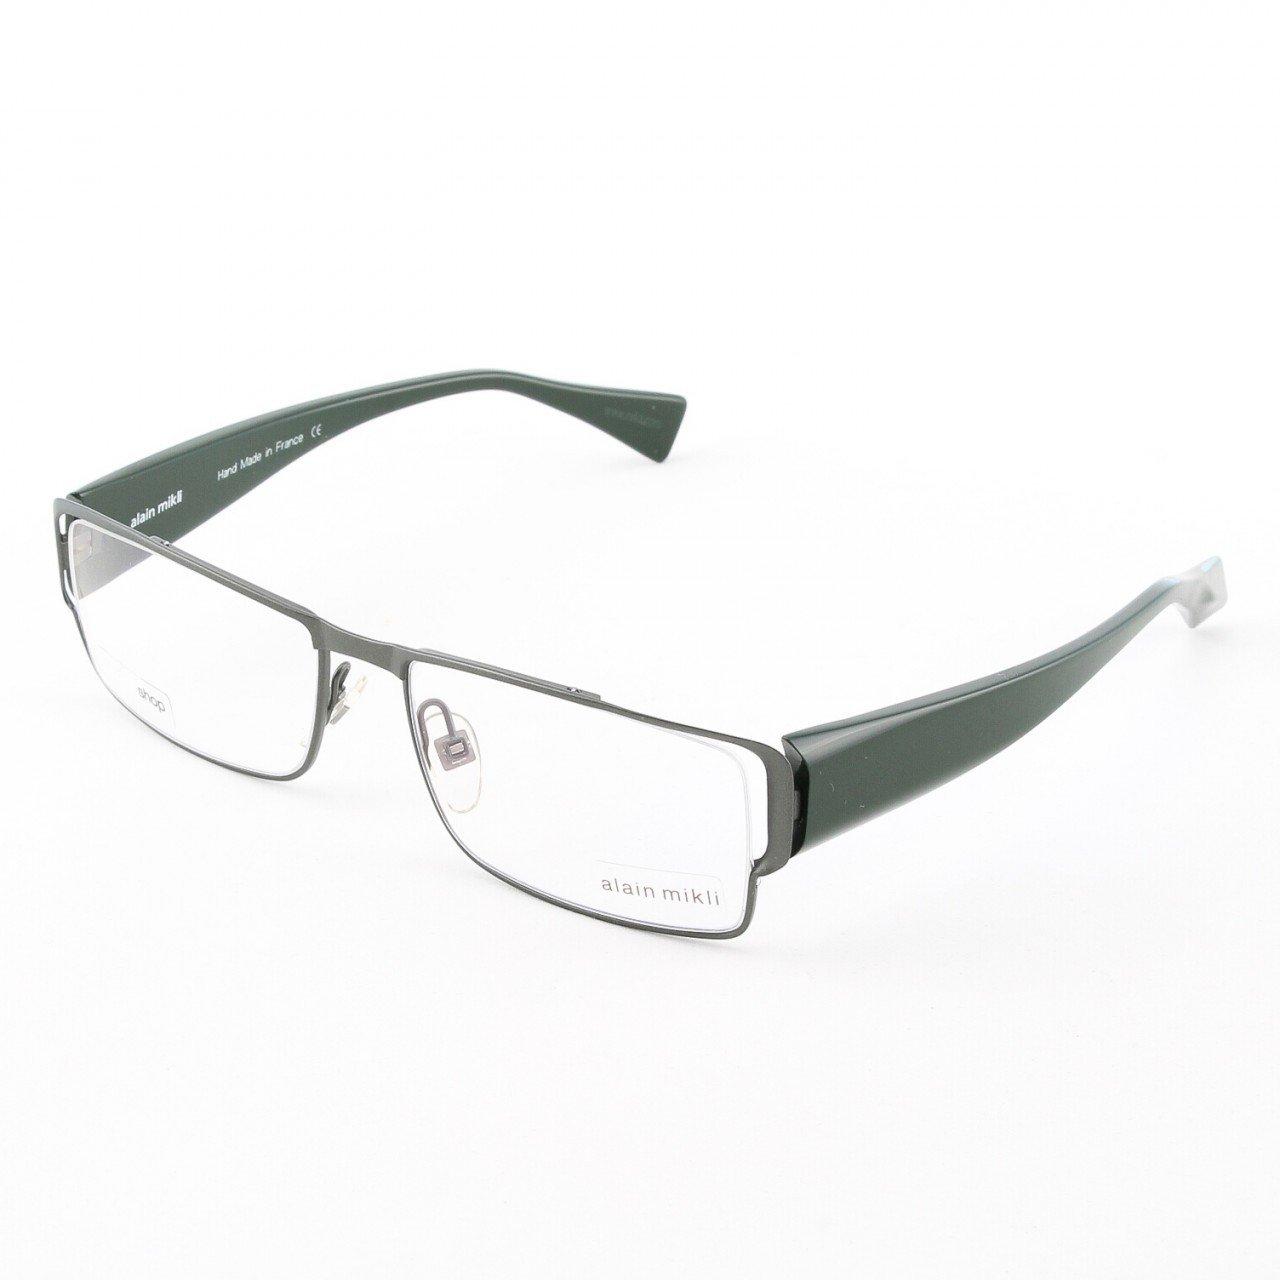 Alain Mikli Eyeglasses AL0868 Col. 4 Gun Metal Frame with Forest Green Temples